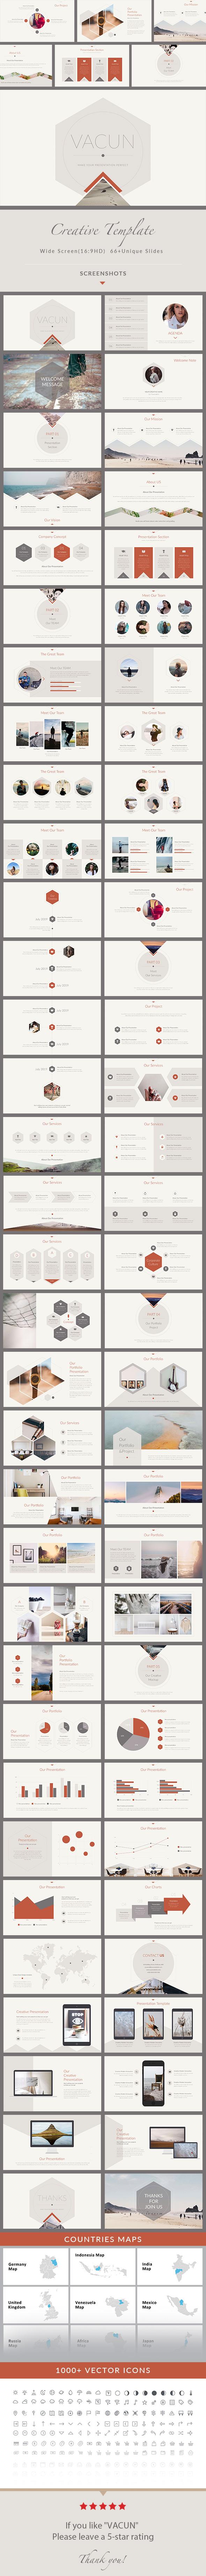 VACUN - Creative PowerPoint Presentation Template - Creative PowerPoint Templates